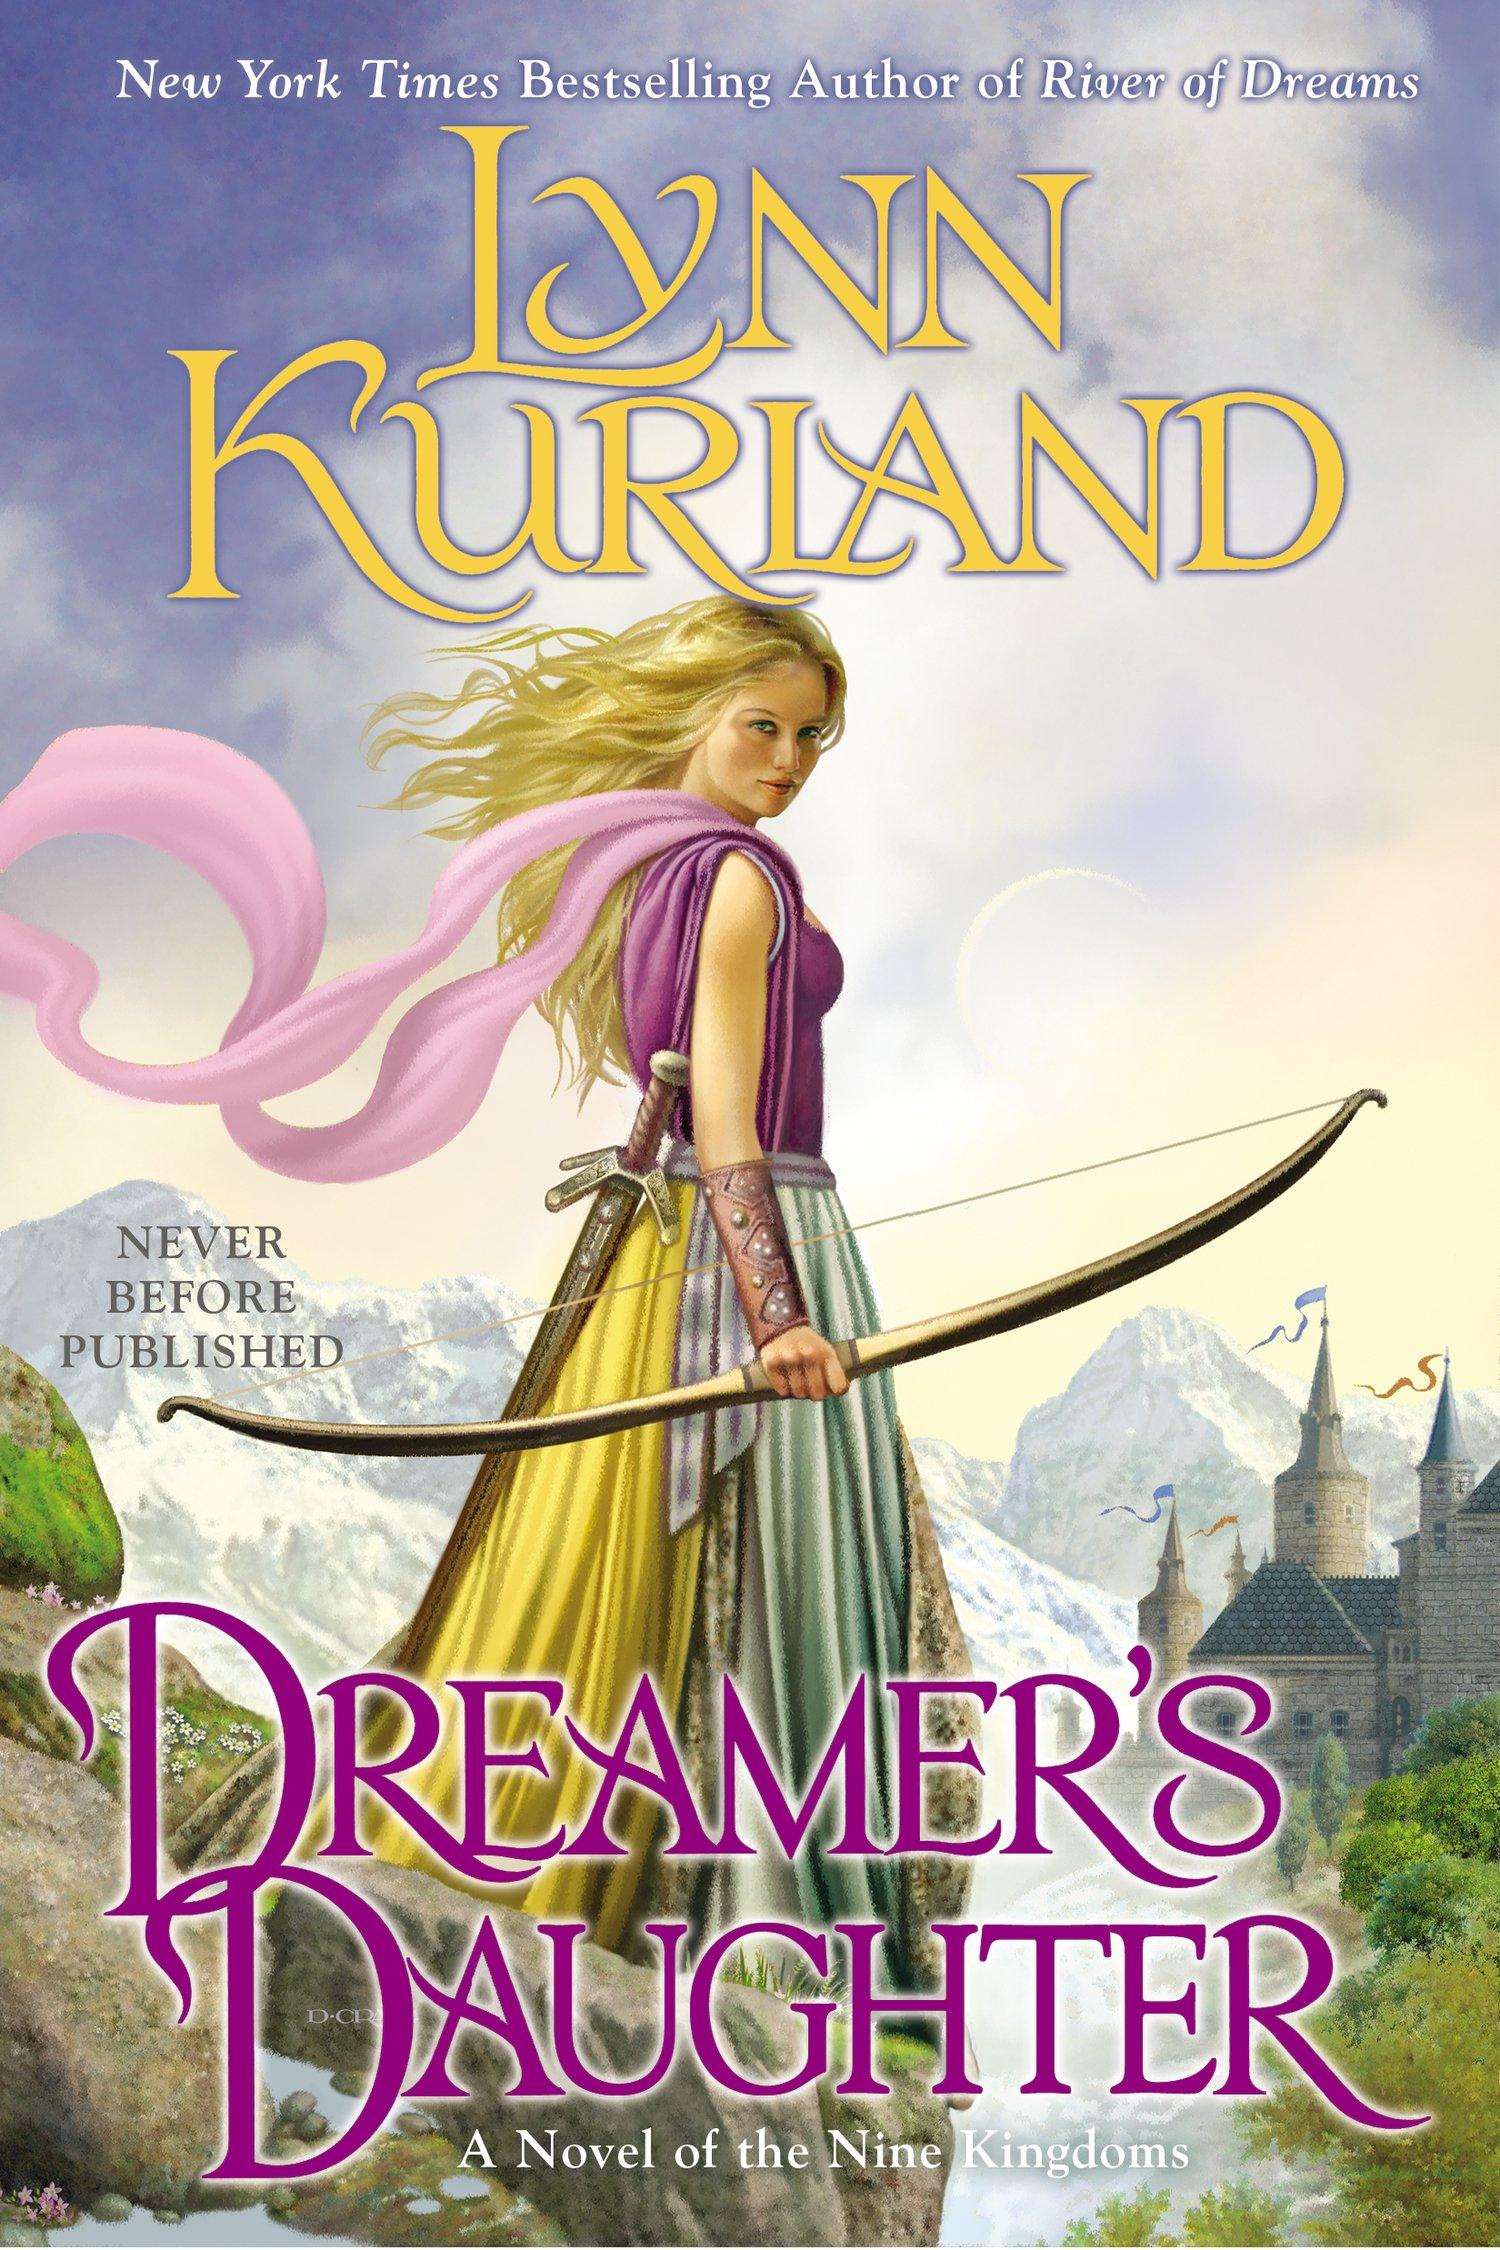 Dreamer's Daughter (a Novel Of The Nine Kingdoms): Lynn Kurland:  9780425262849: Amazon: Books